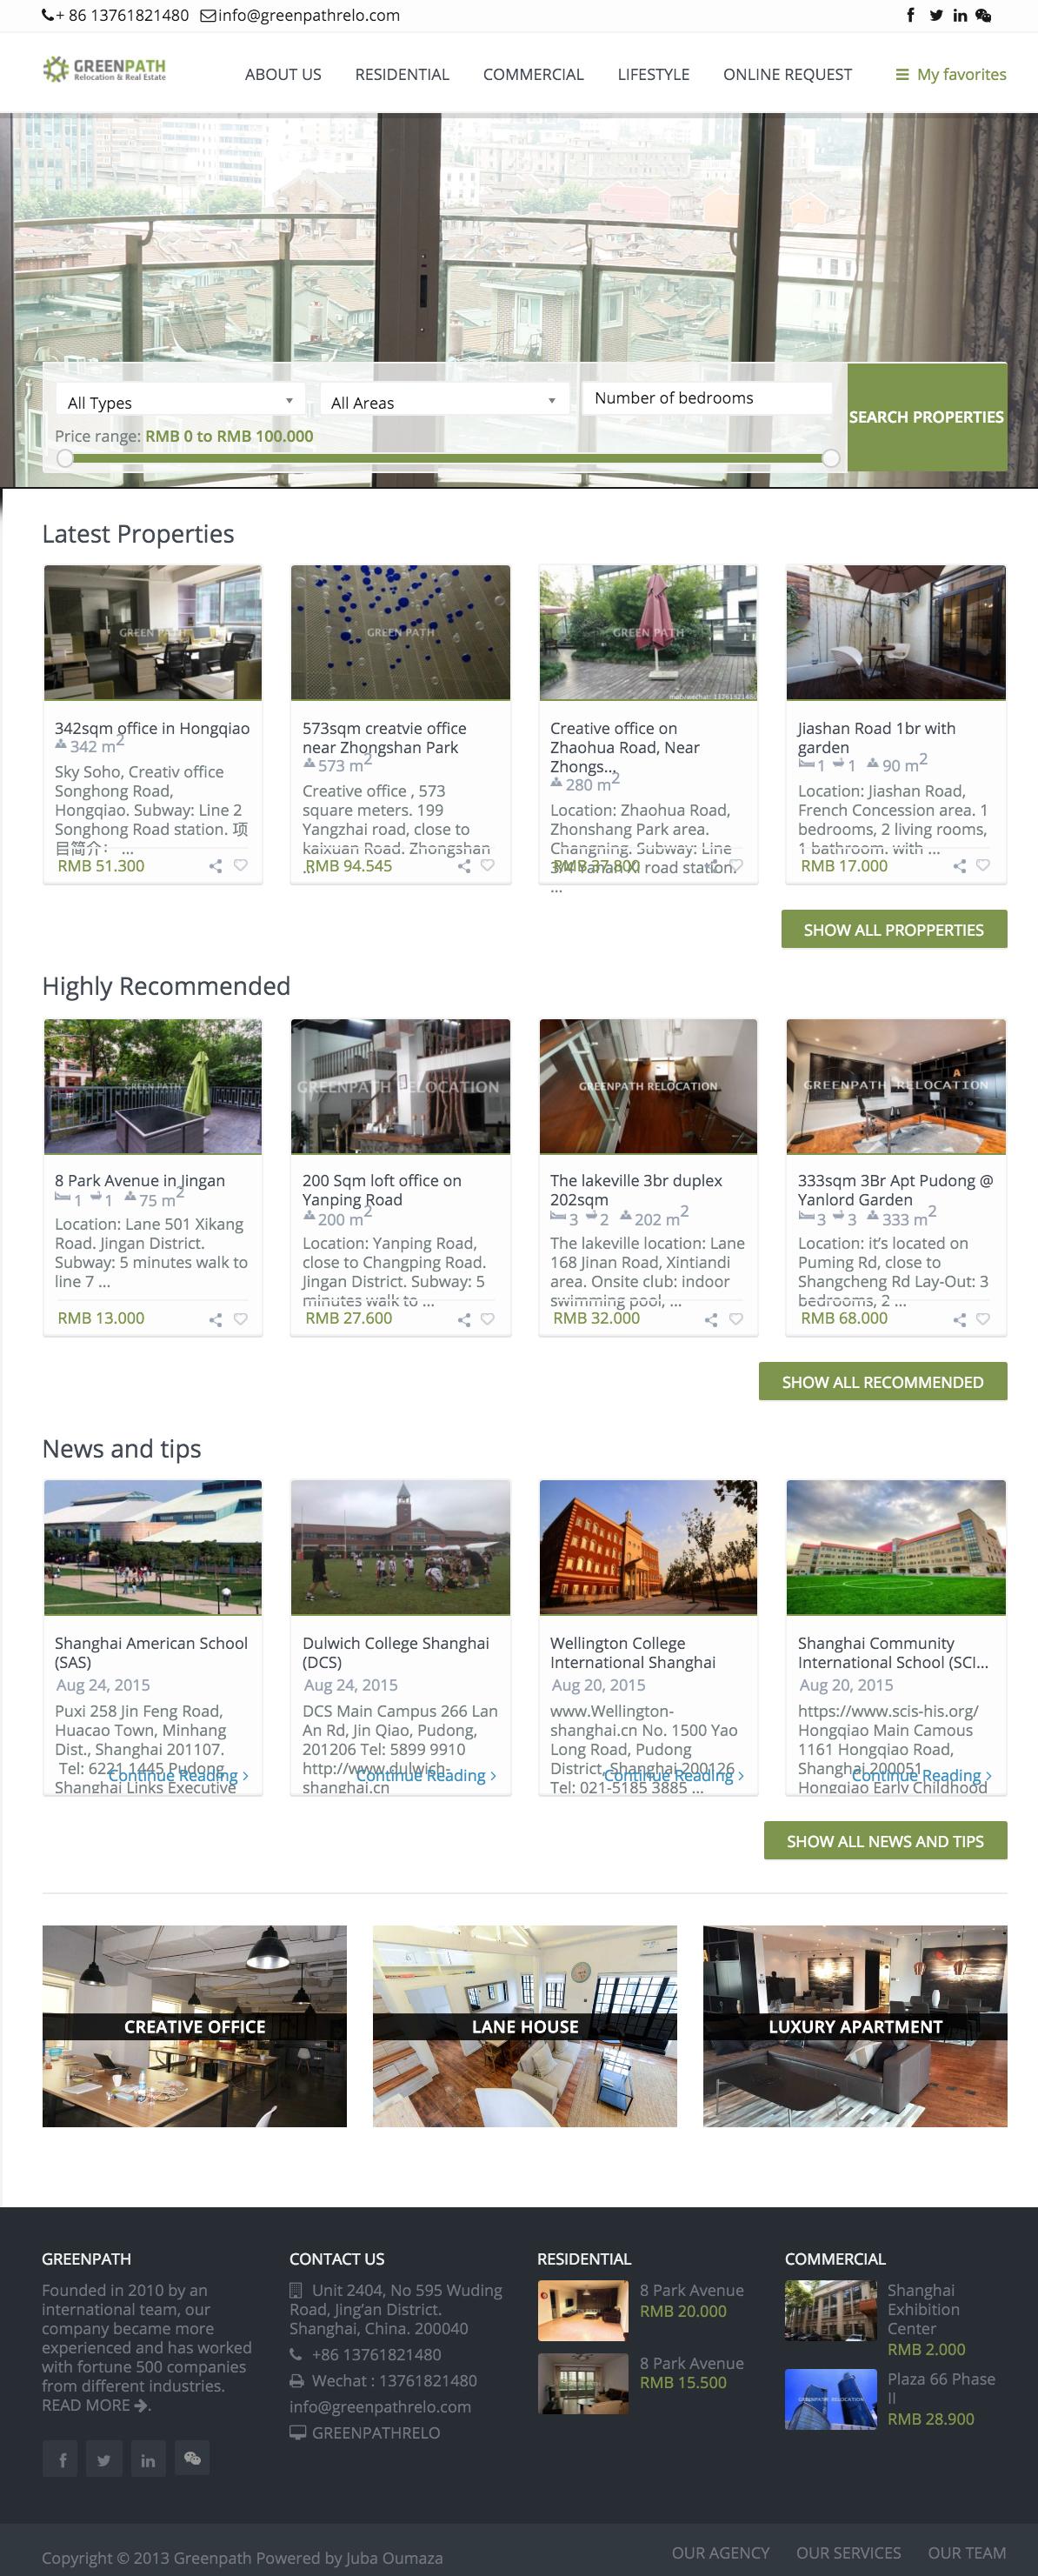 greenpathrelo-homepage